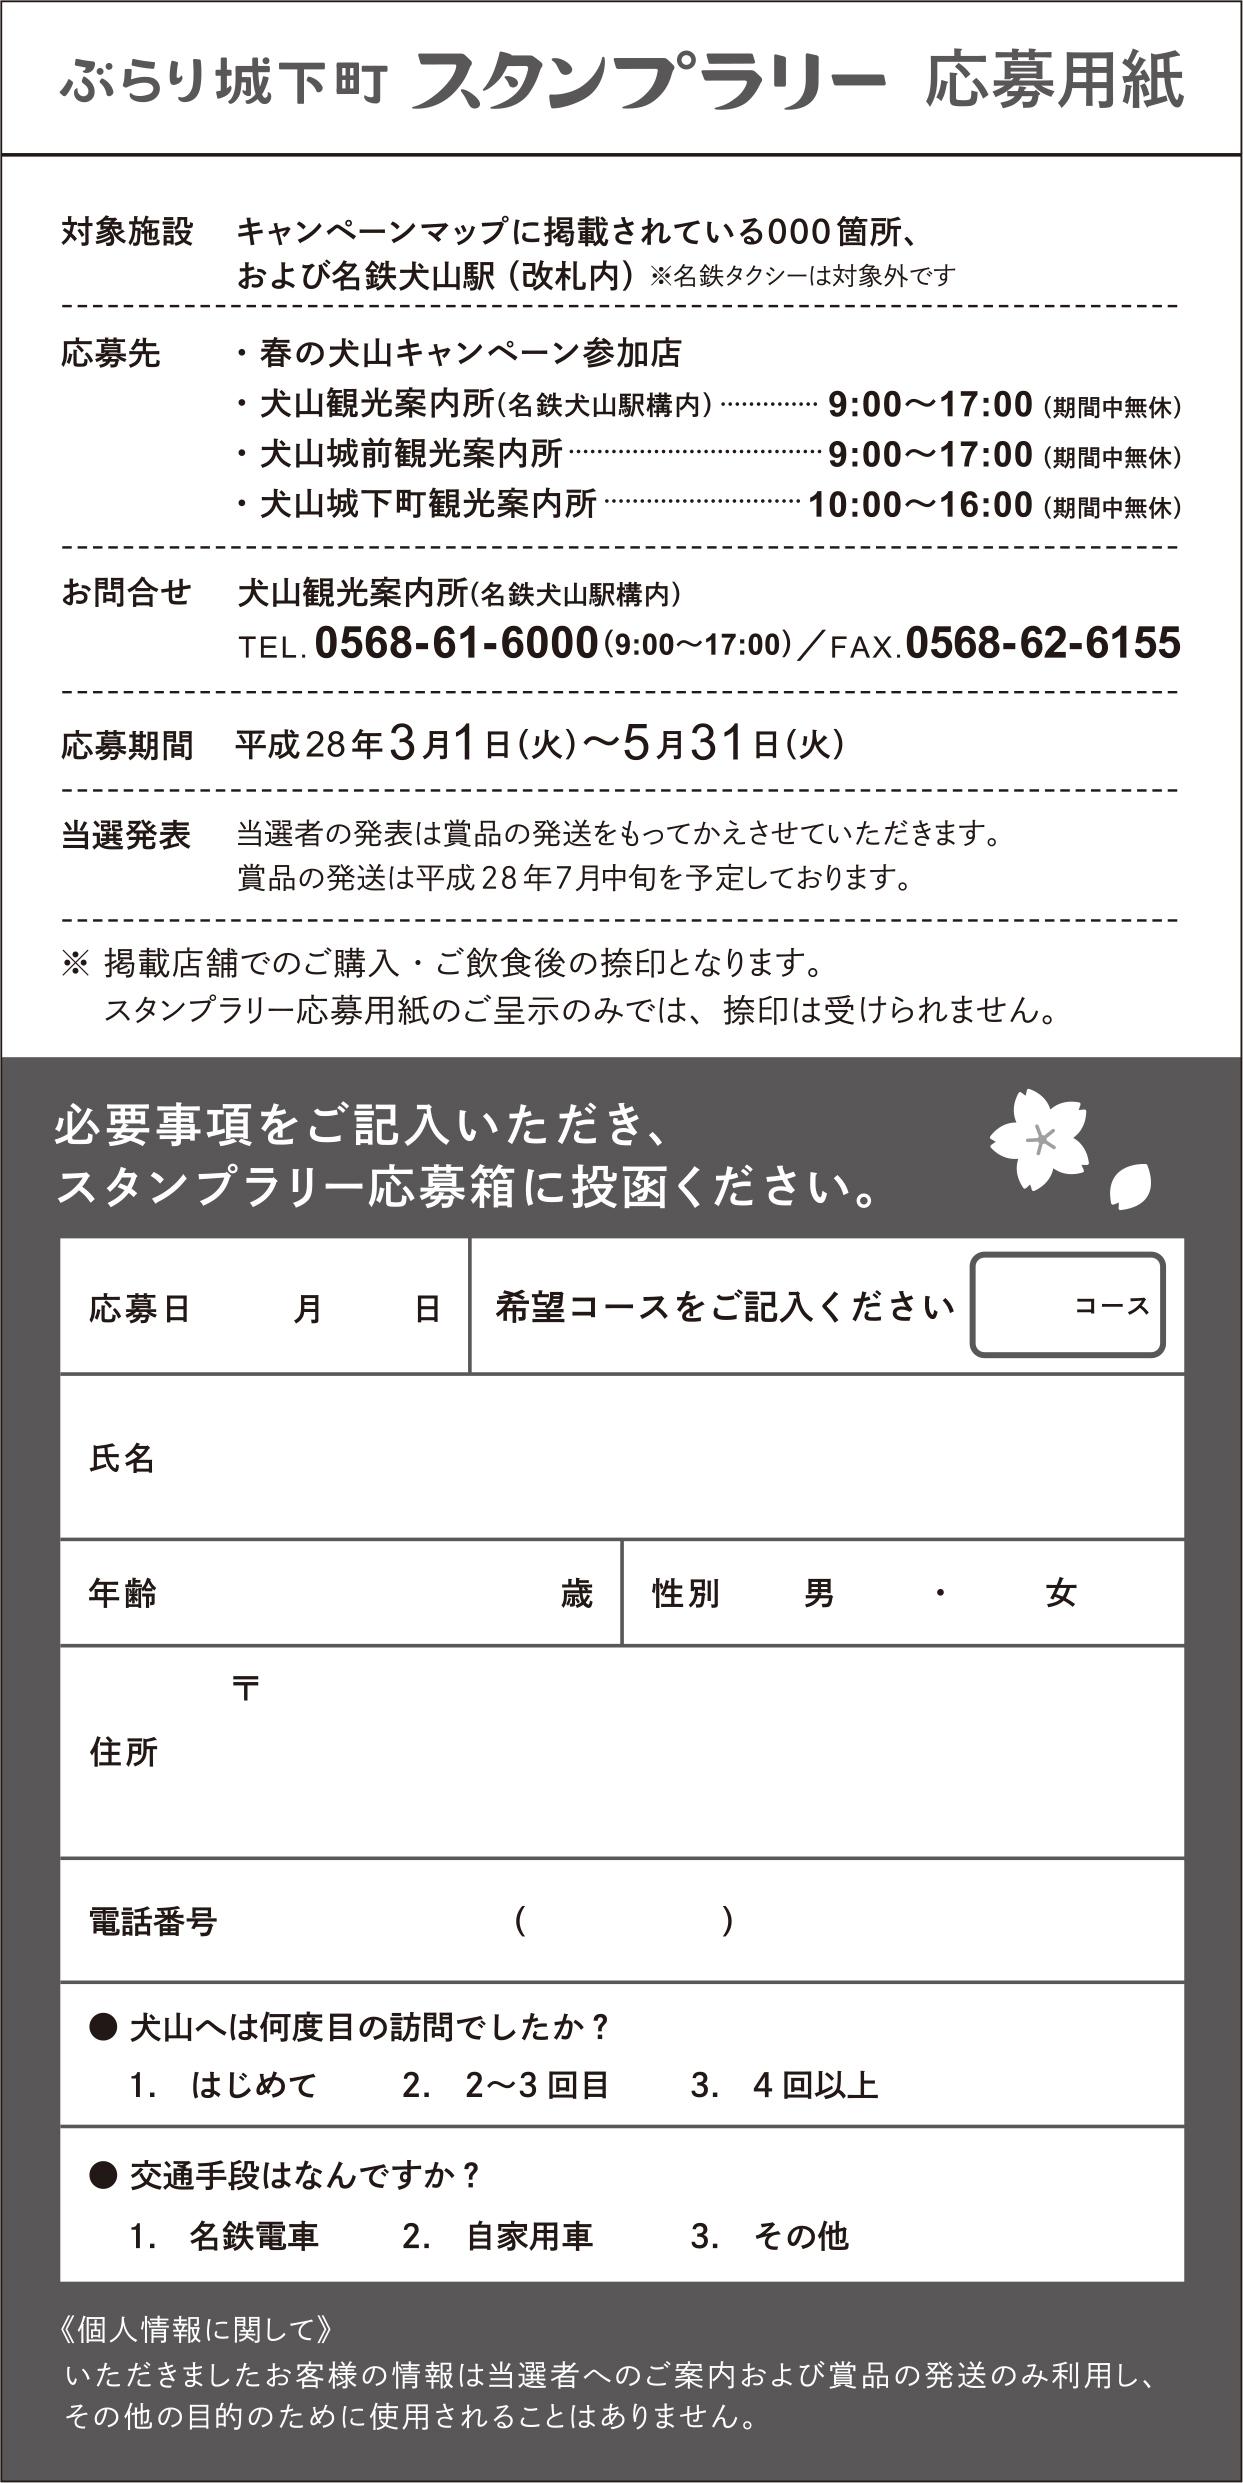 stamp-daishi-ura